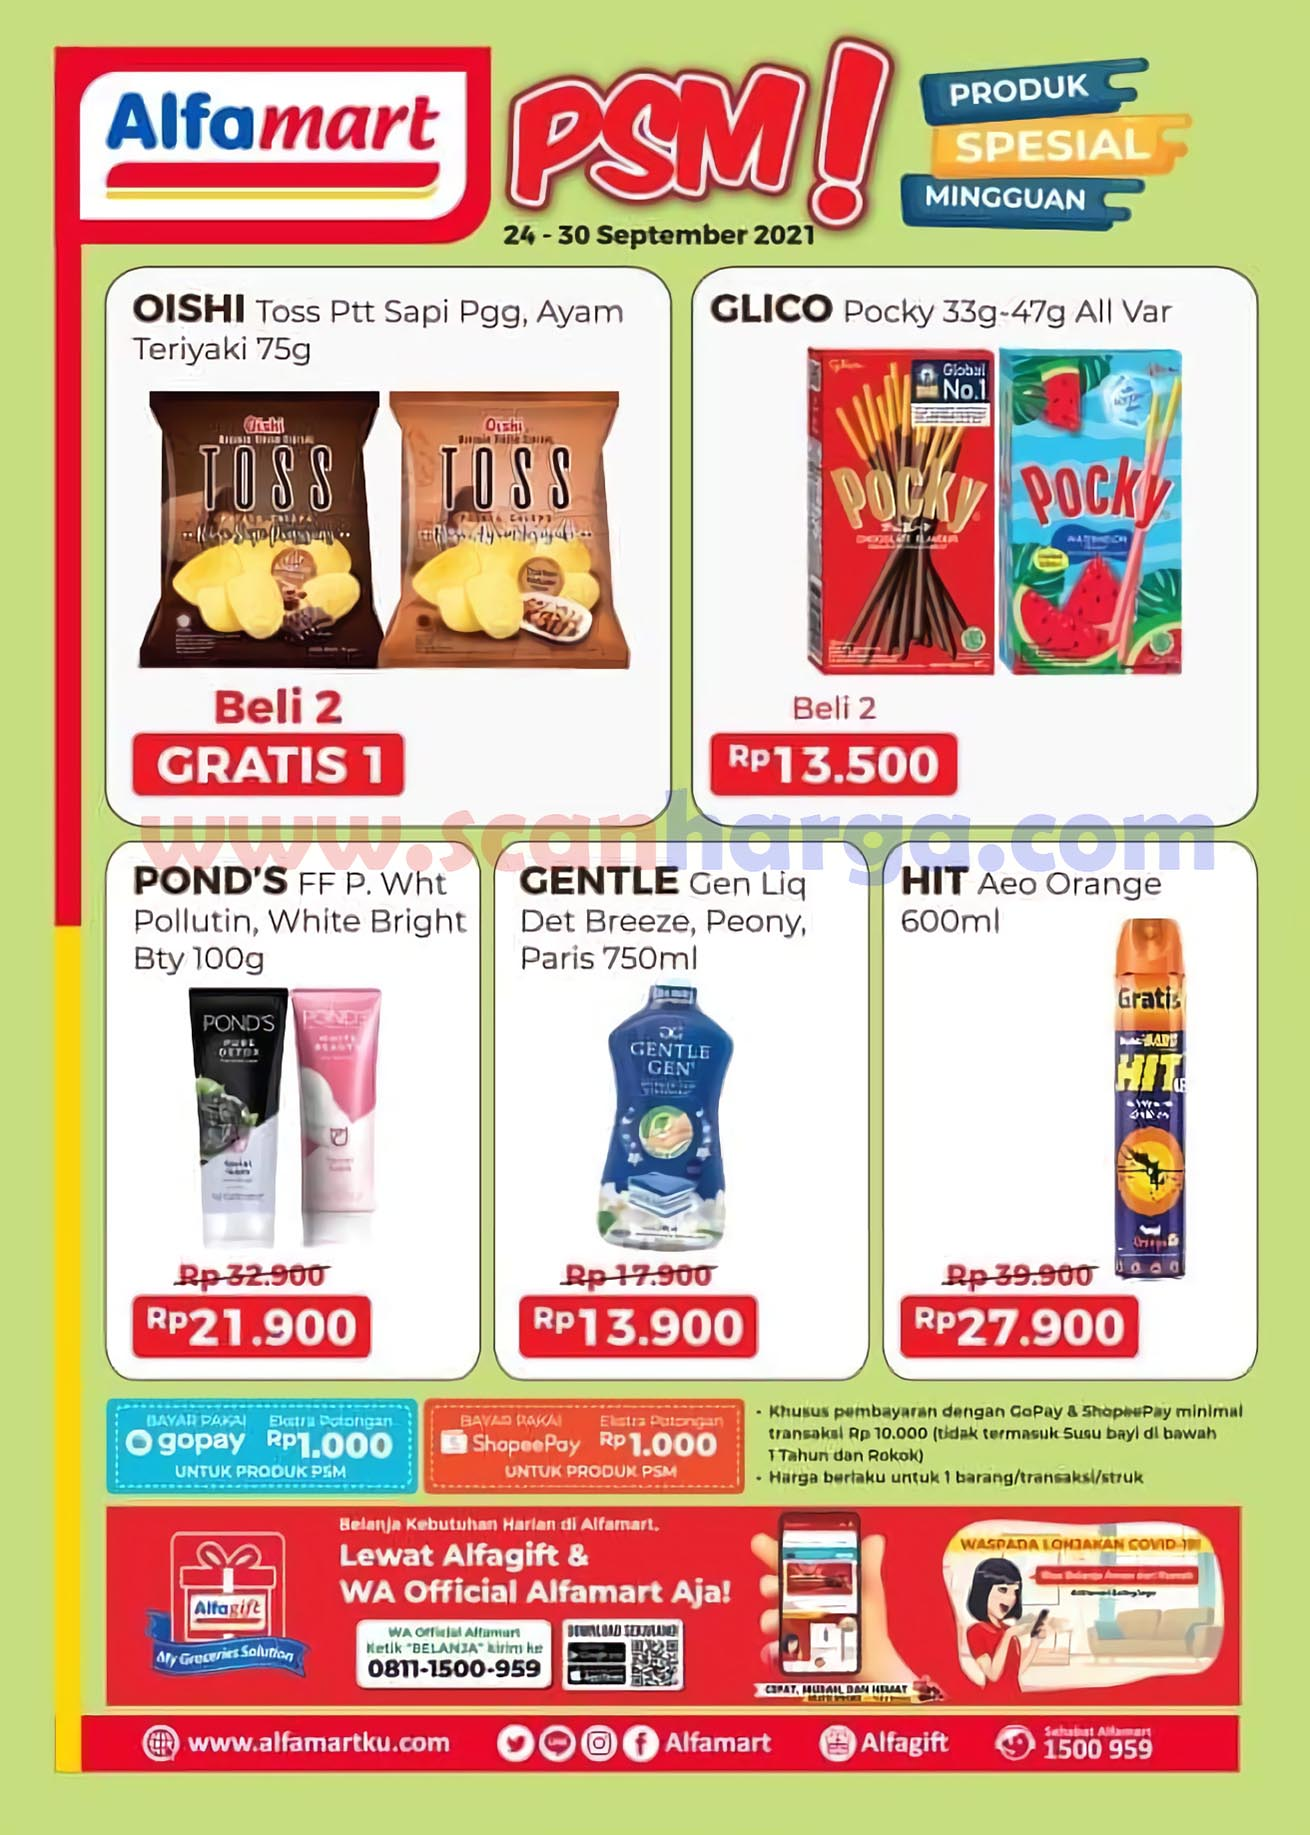 Katalog Promo PSM Alfamart 24 - 30 September 2021